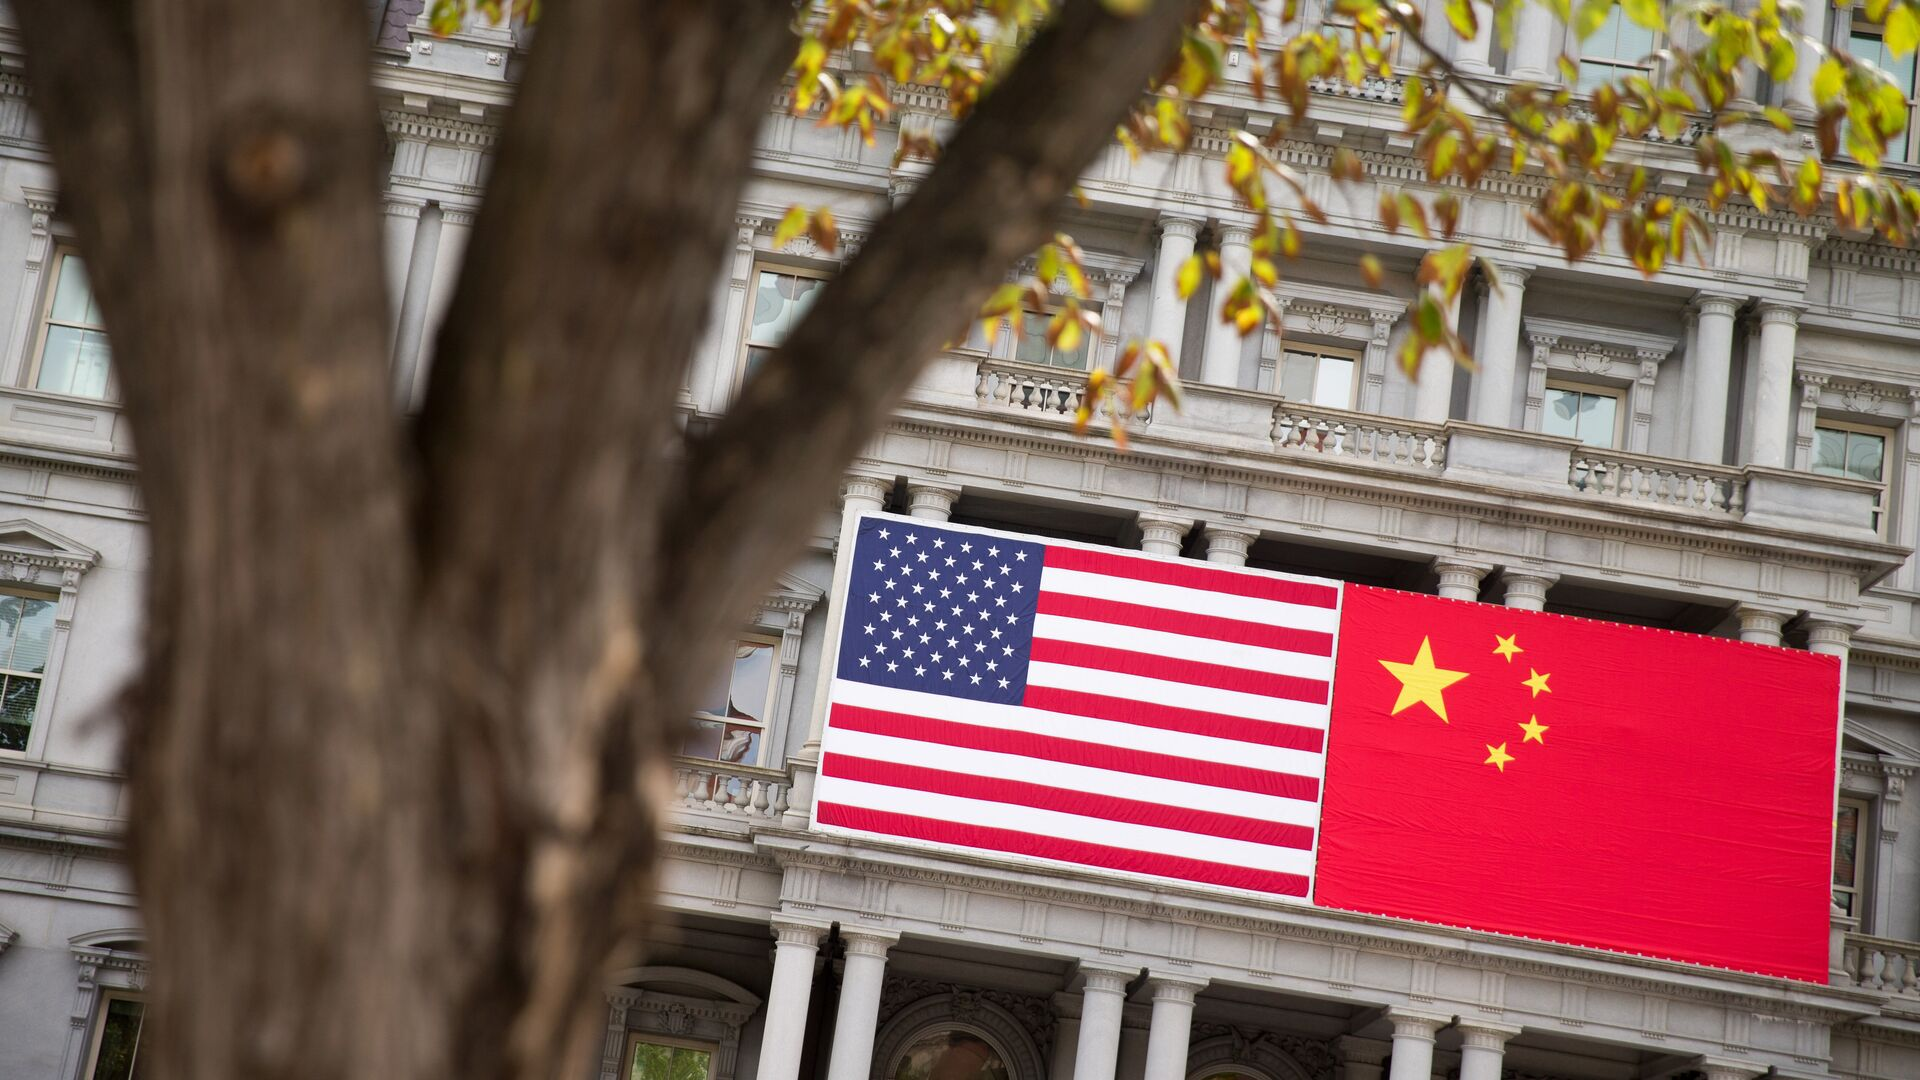 Флаги США и Китая - РИА Новости, 1920, 05.12.2020